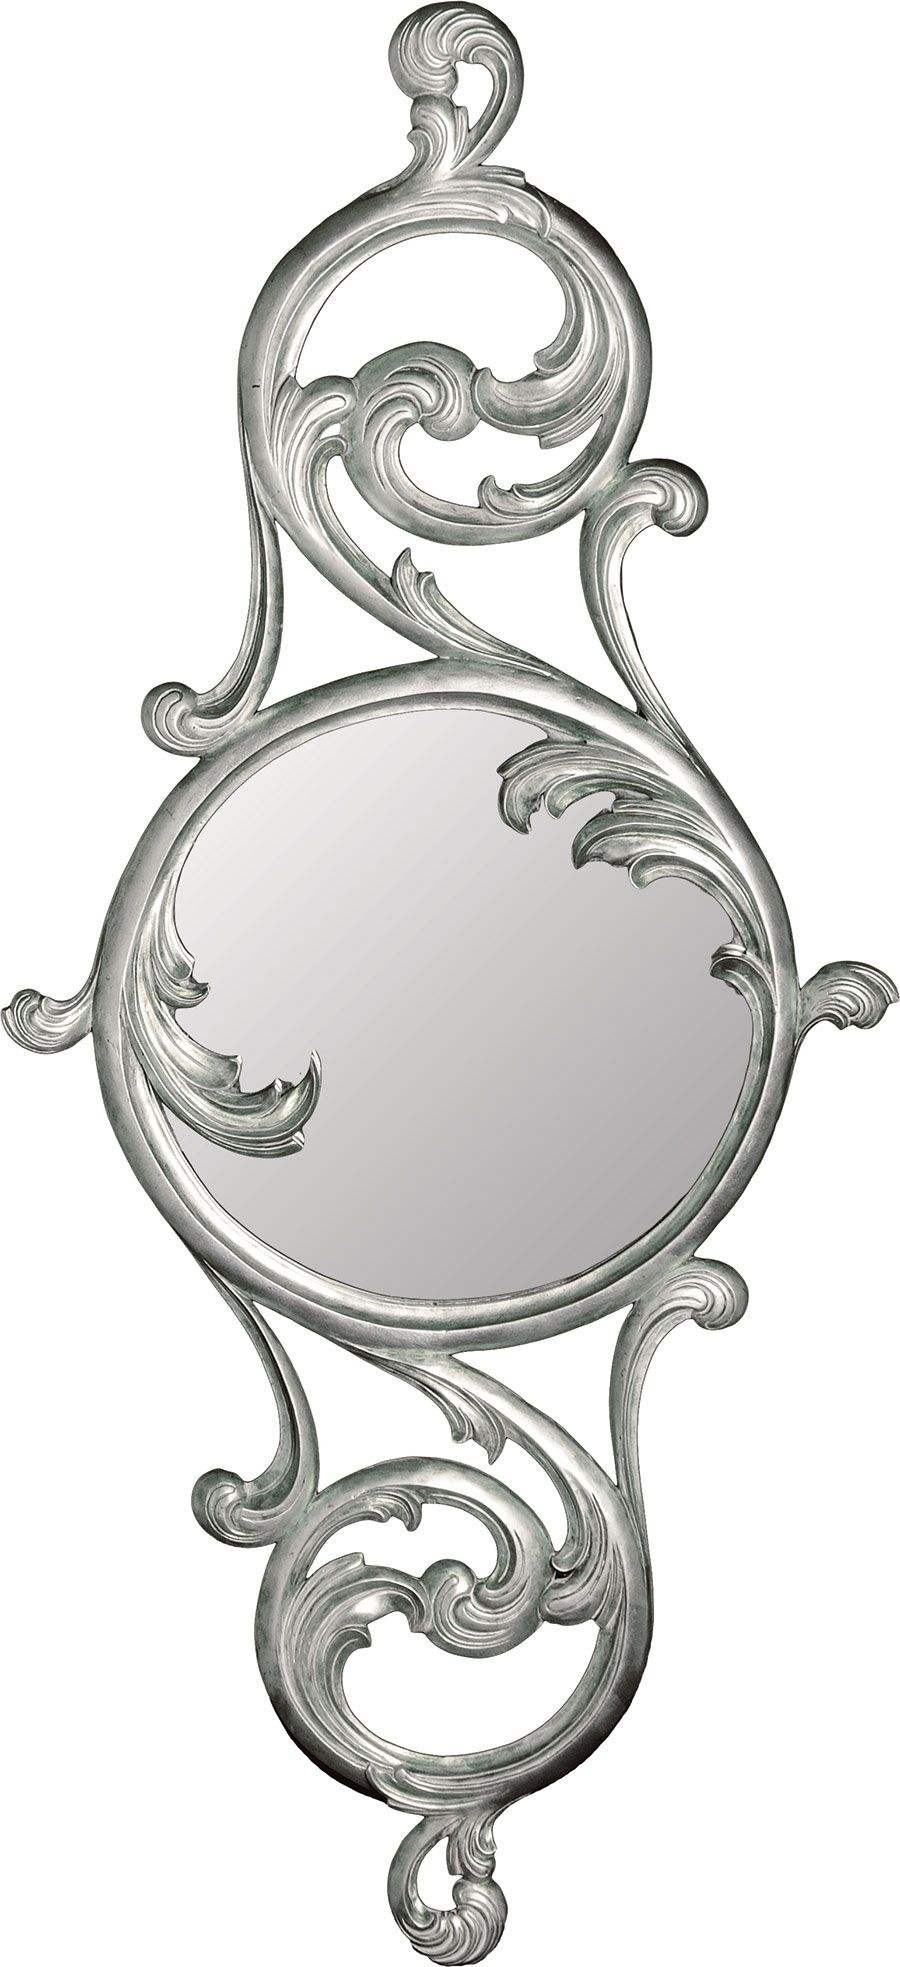 Dimensions timeless elegance ornaments схема